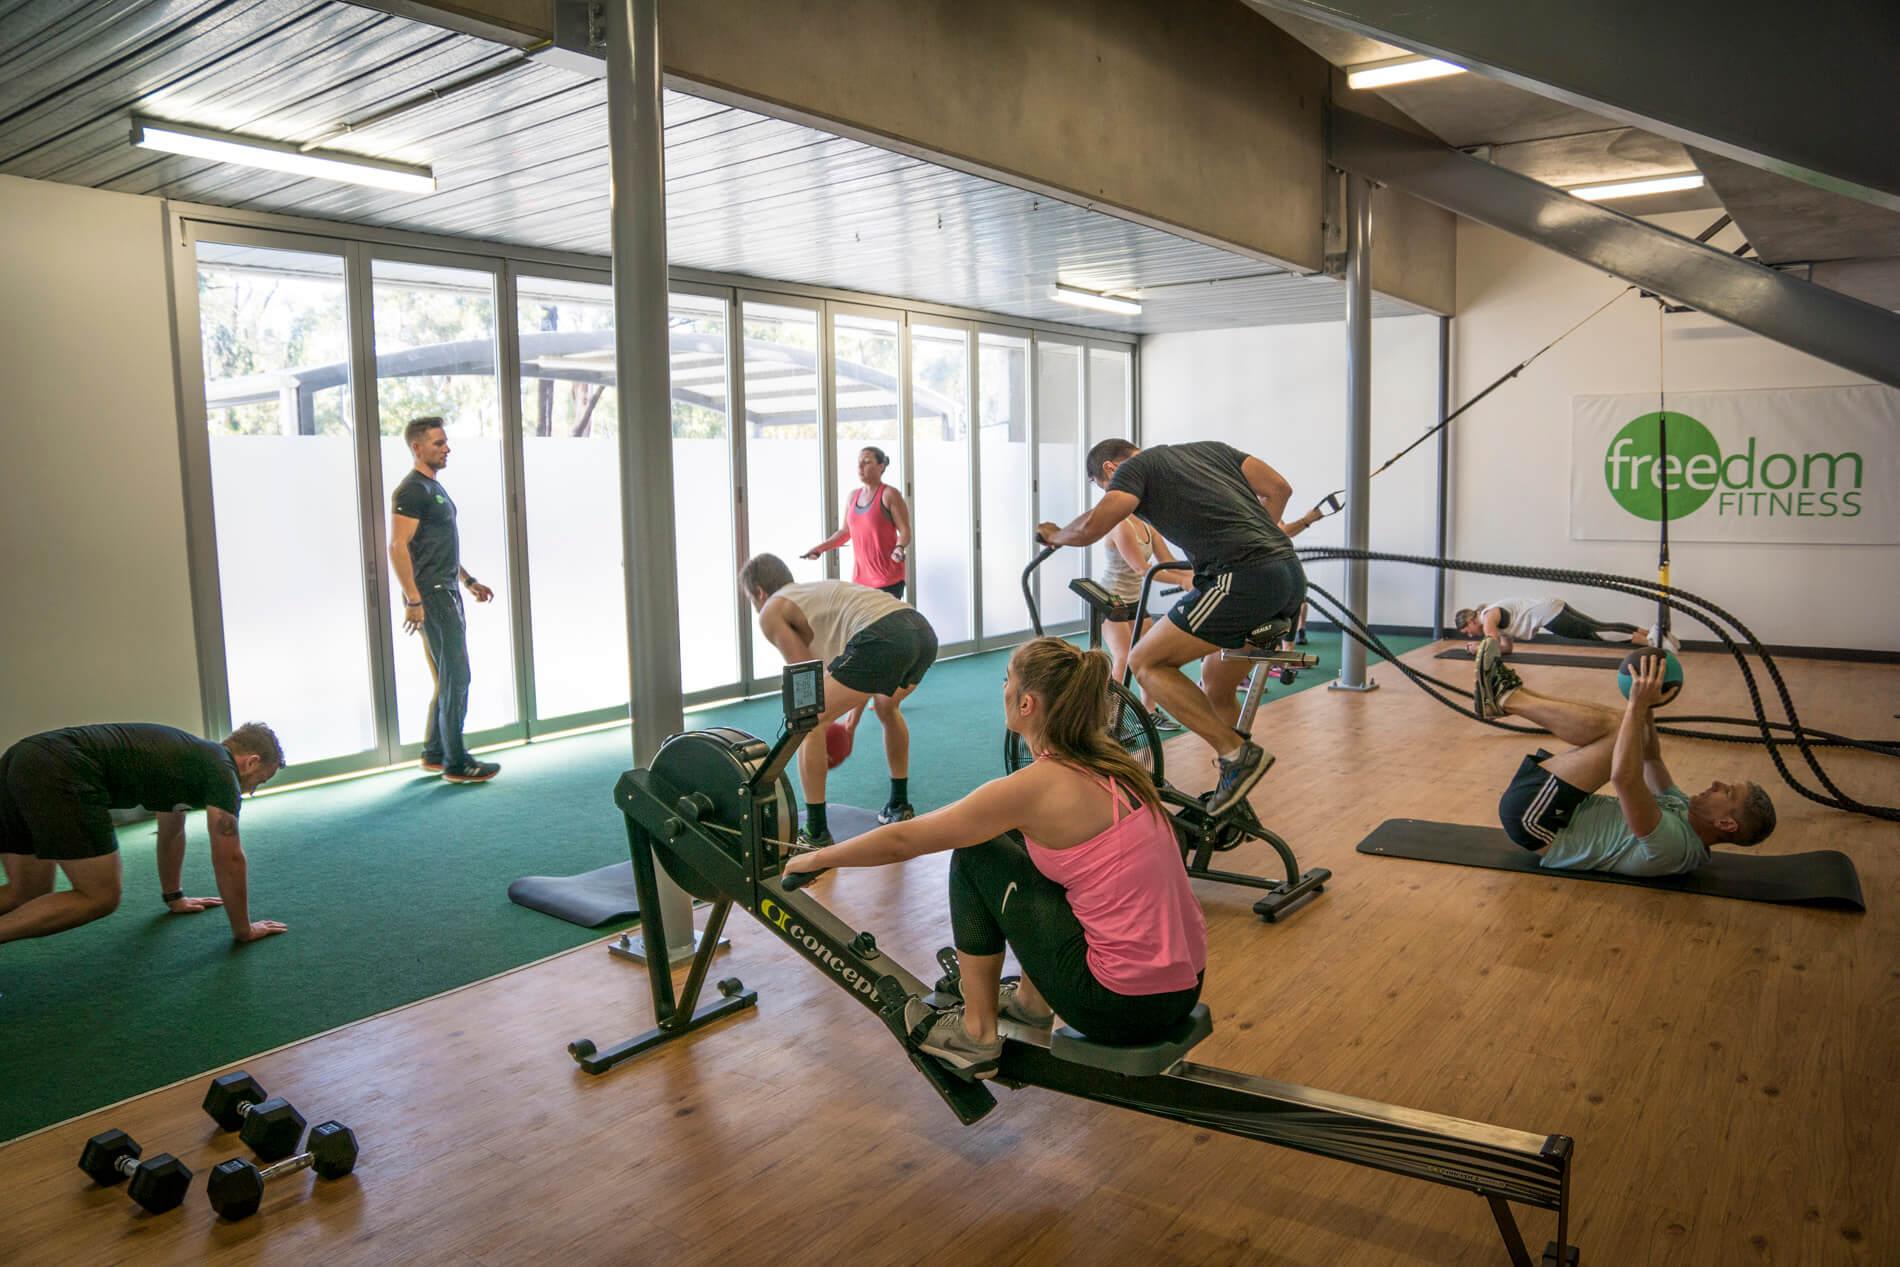 freedom-fitness-tasmania-group-fitness-training-personal-training